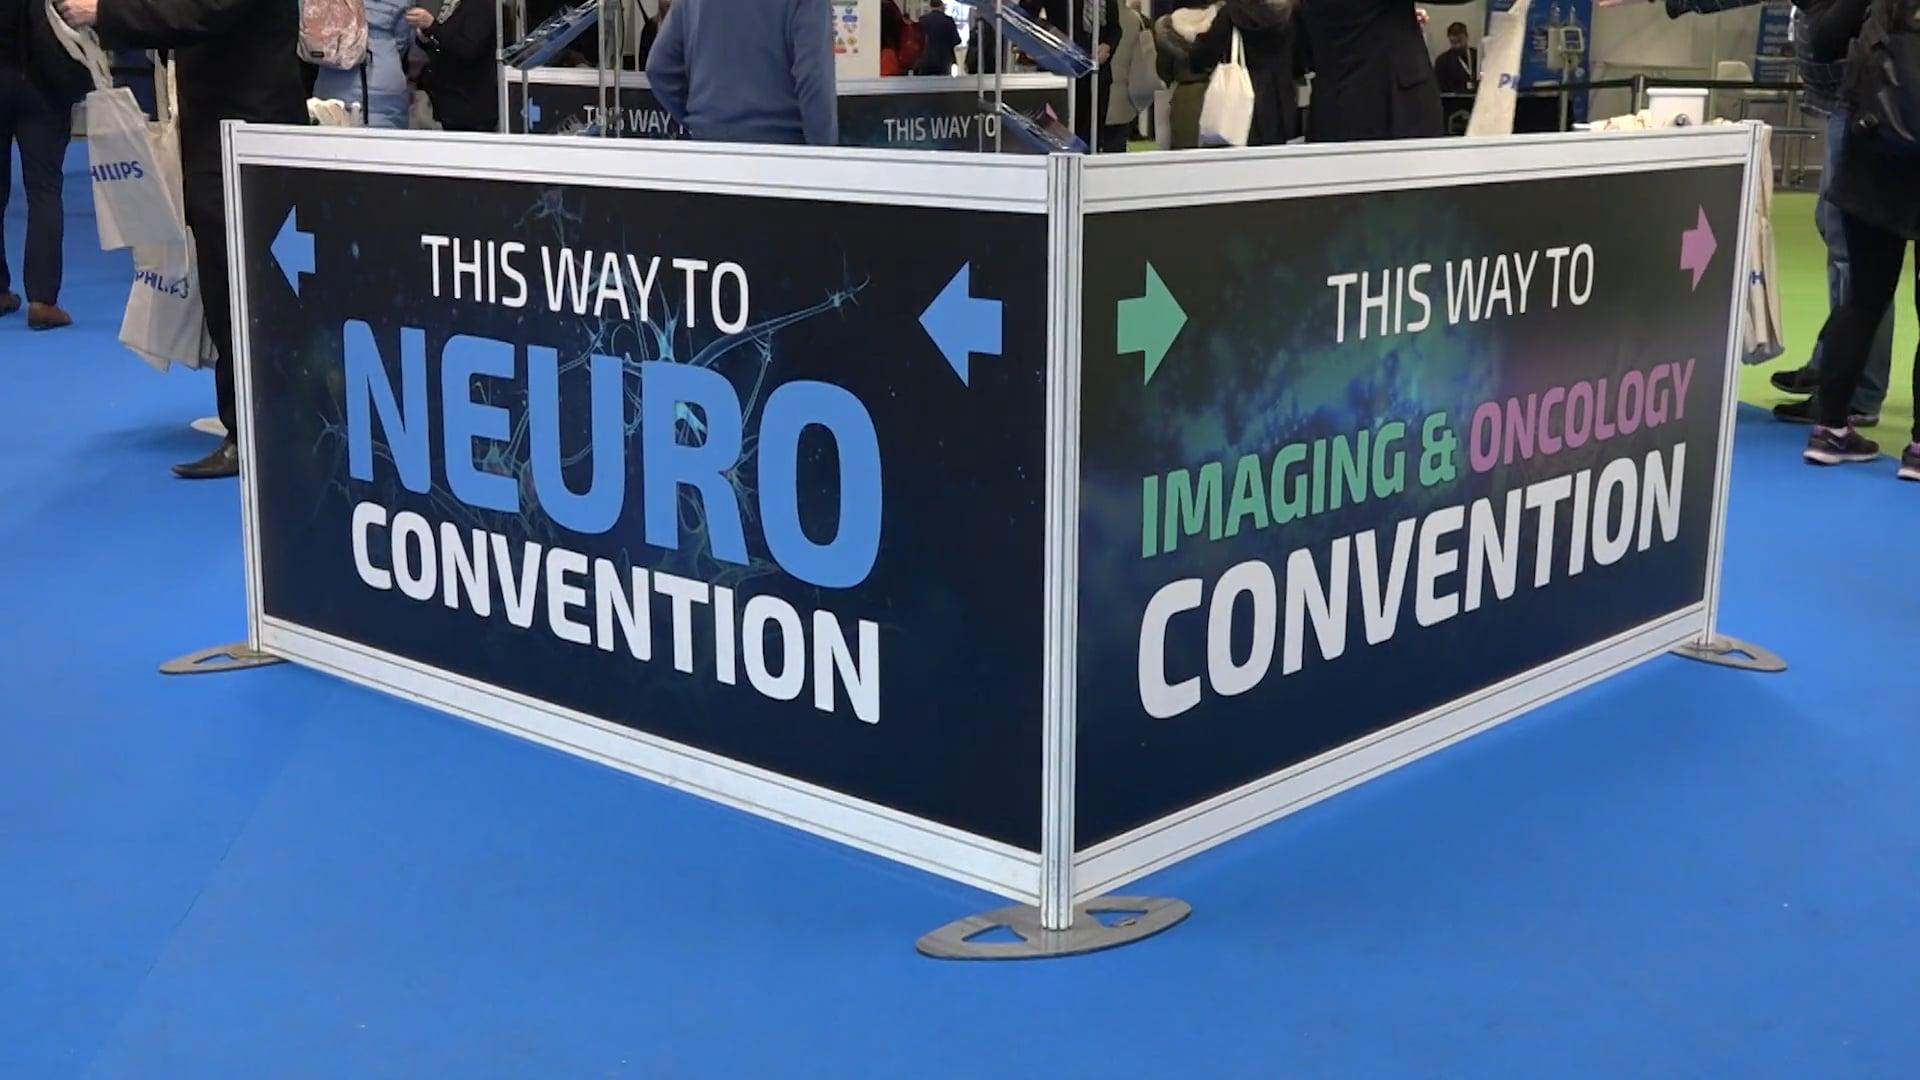 Medical Convention@NEC